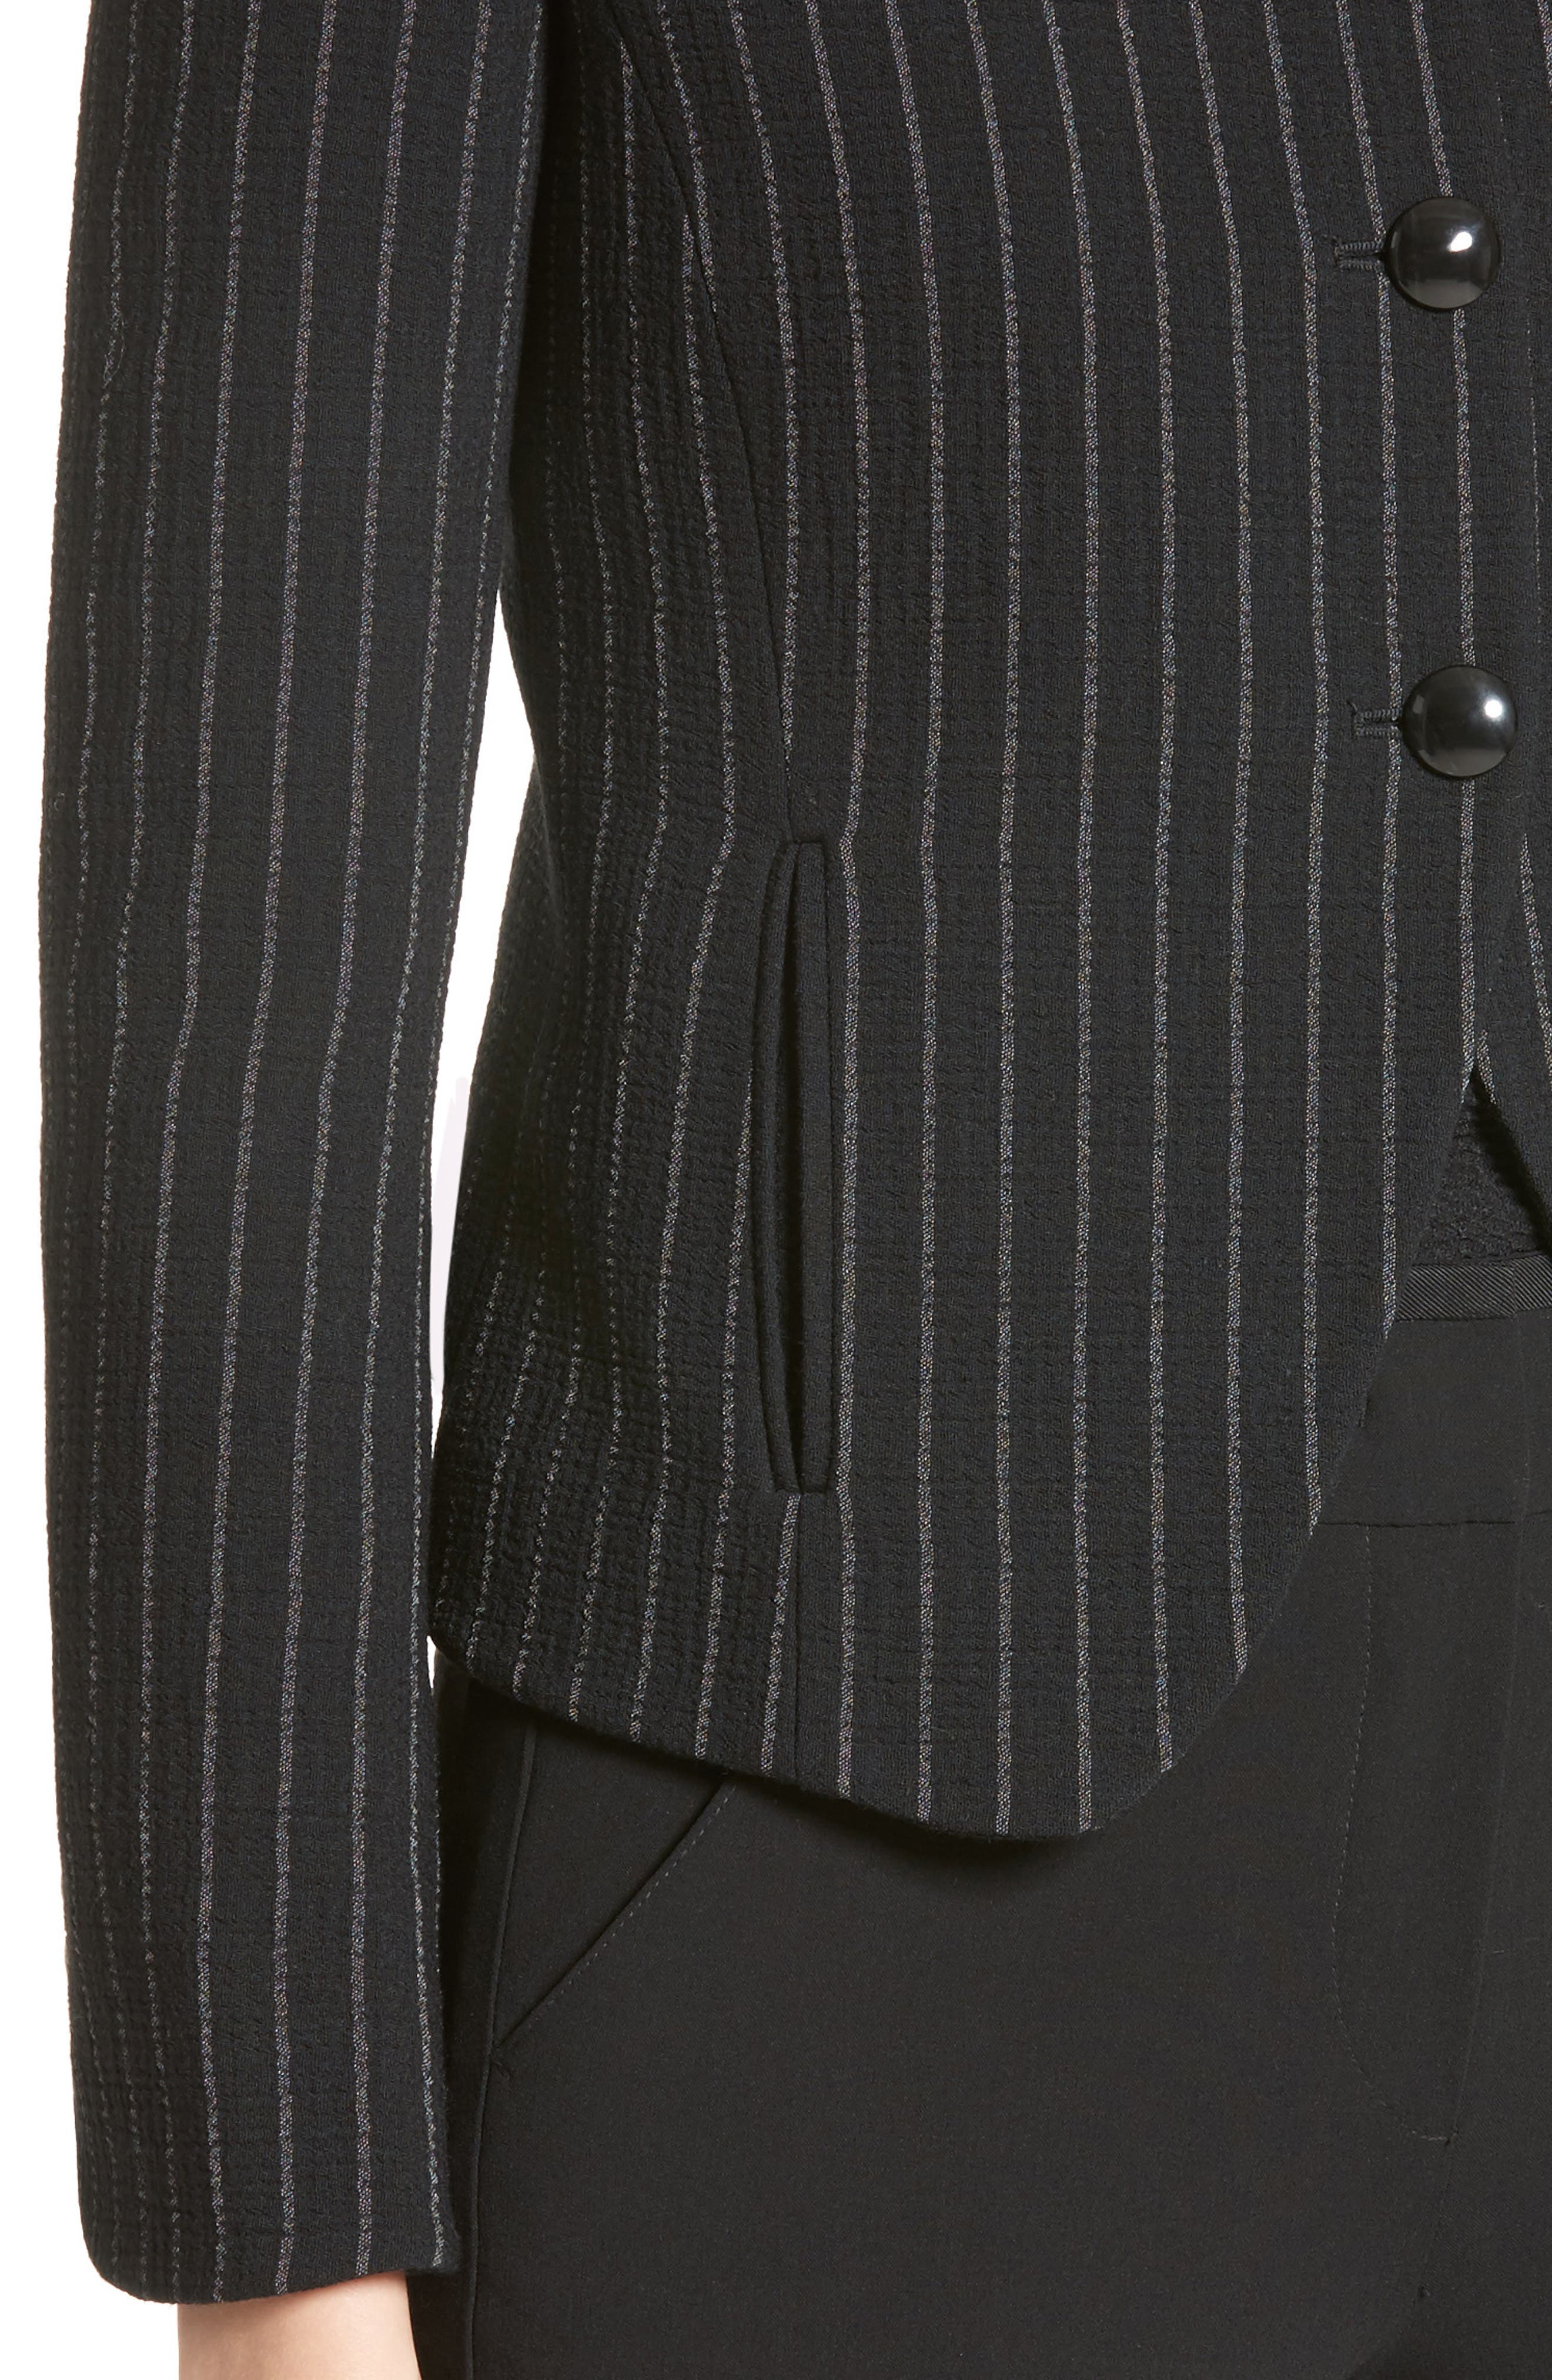 Stretch Wool Pinstripe Jacket,                             Alternate thumbnail 4, color,                             001